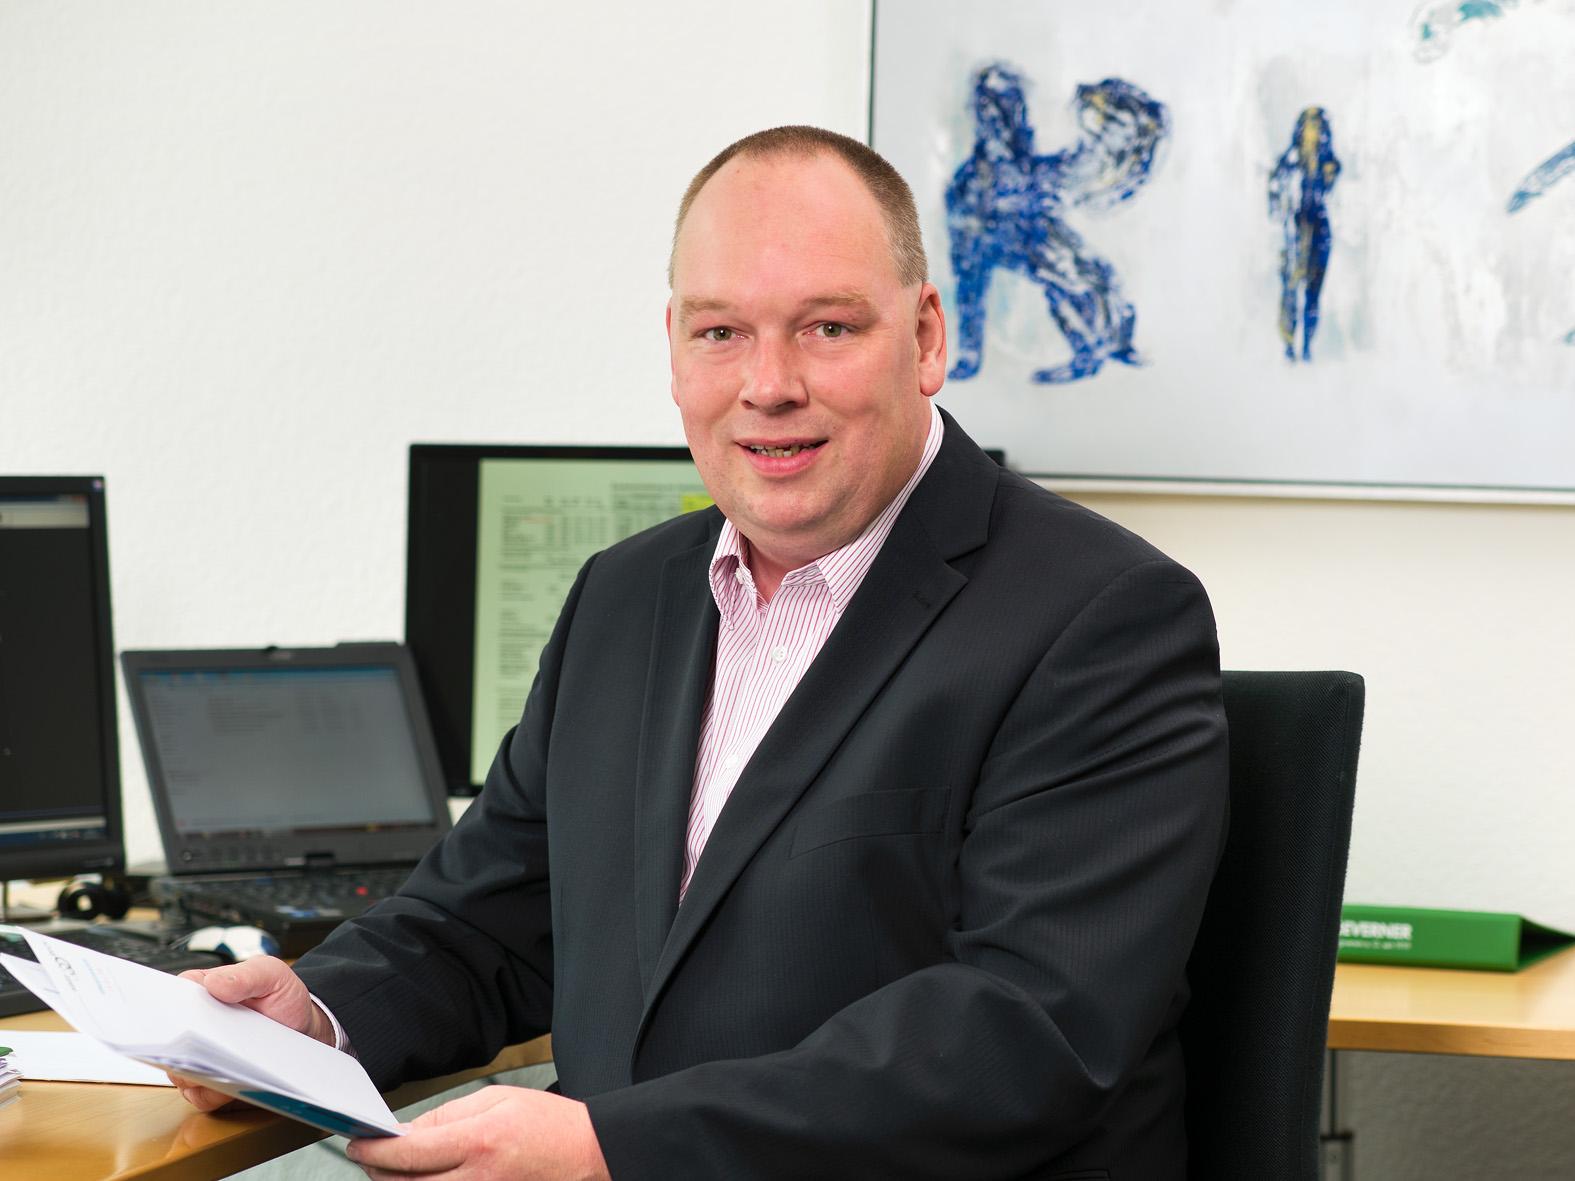 Dieter Schulze Zumkley